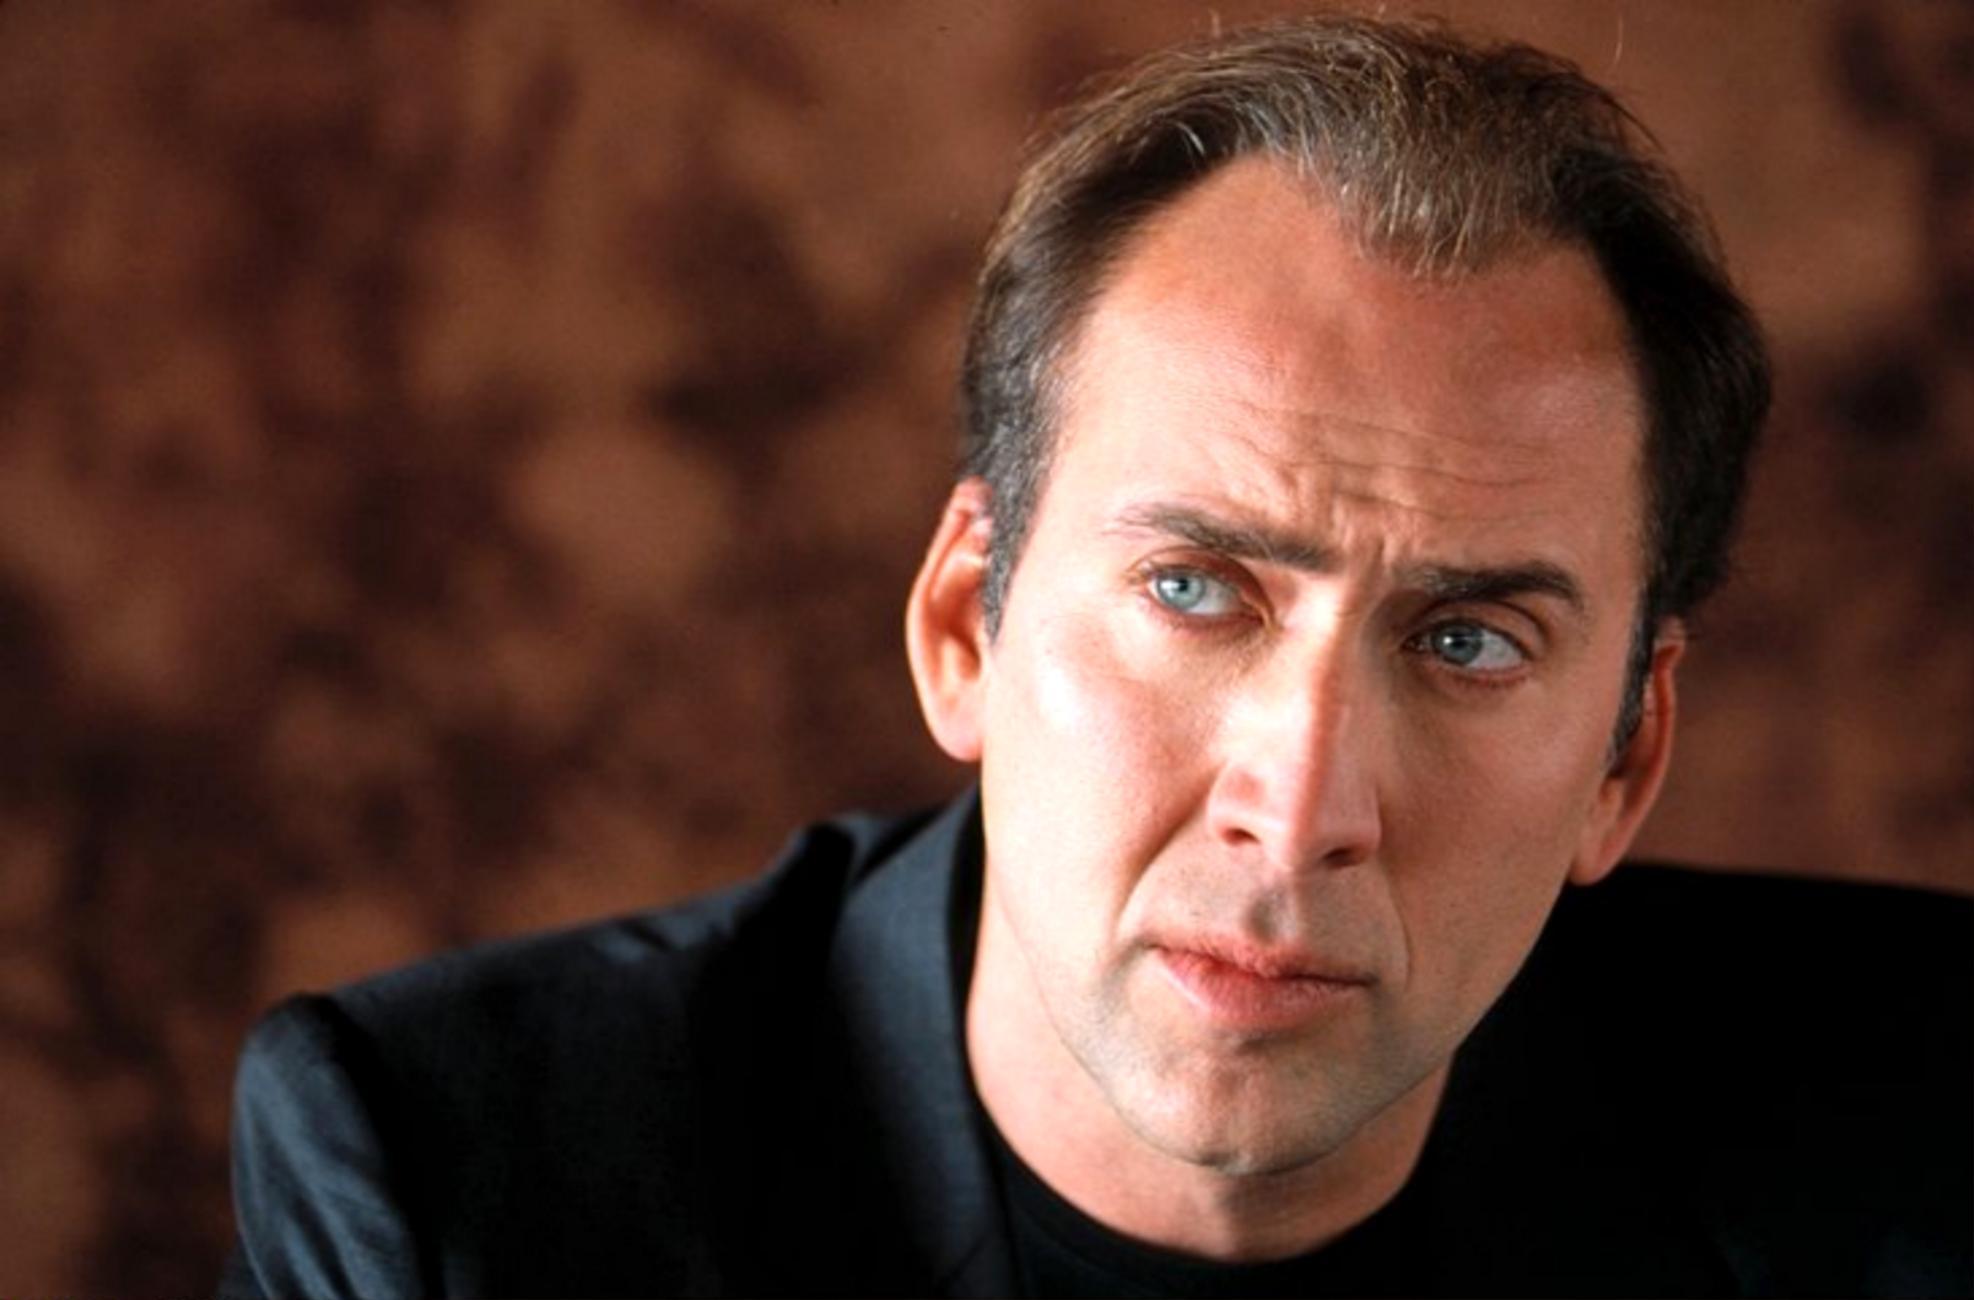 Nicolas Cage picture image